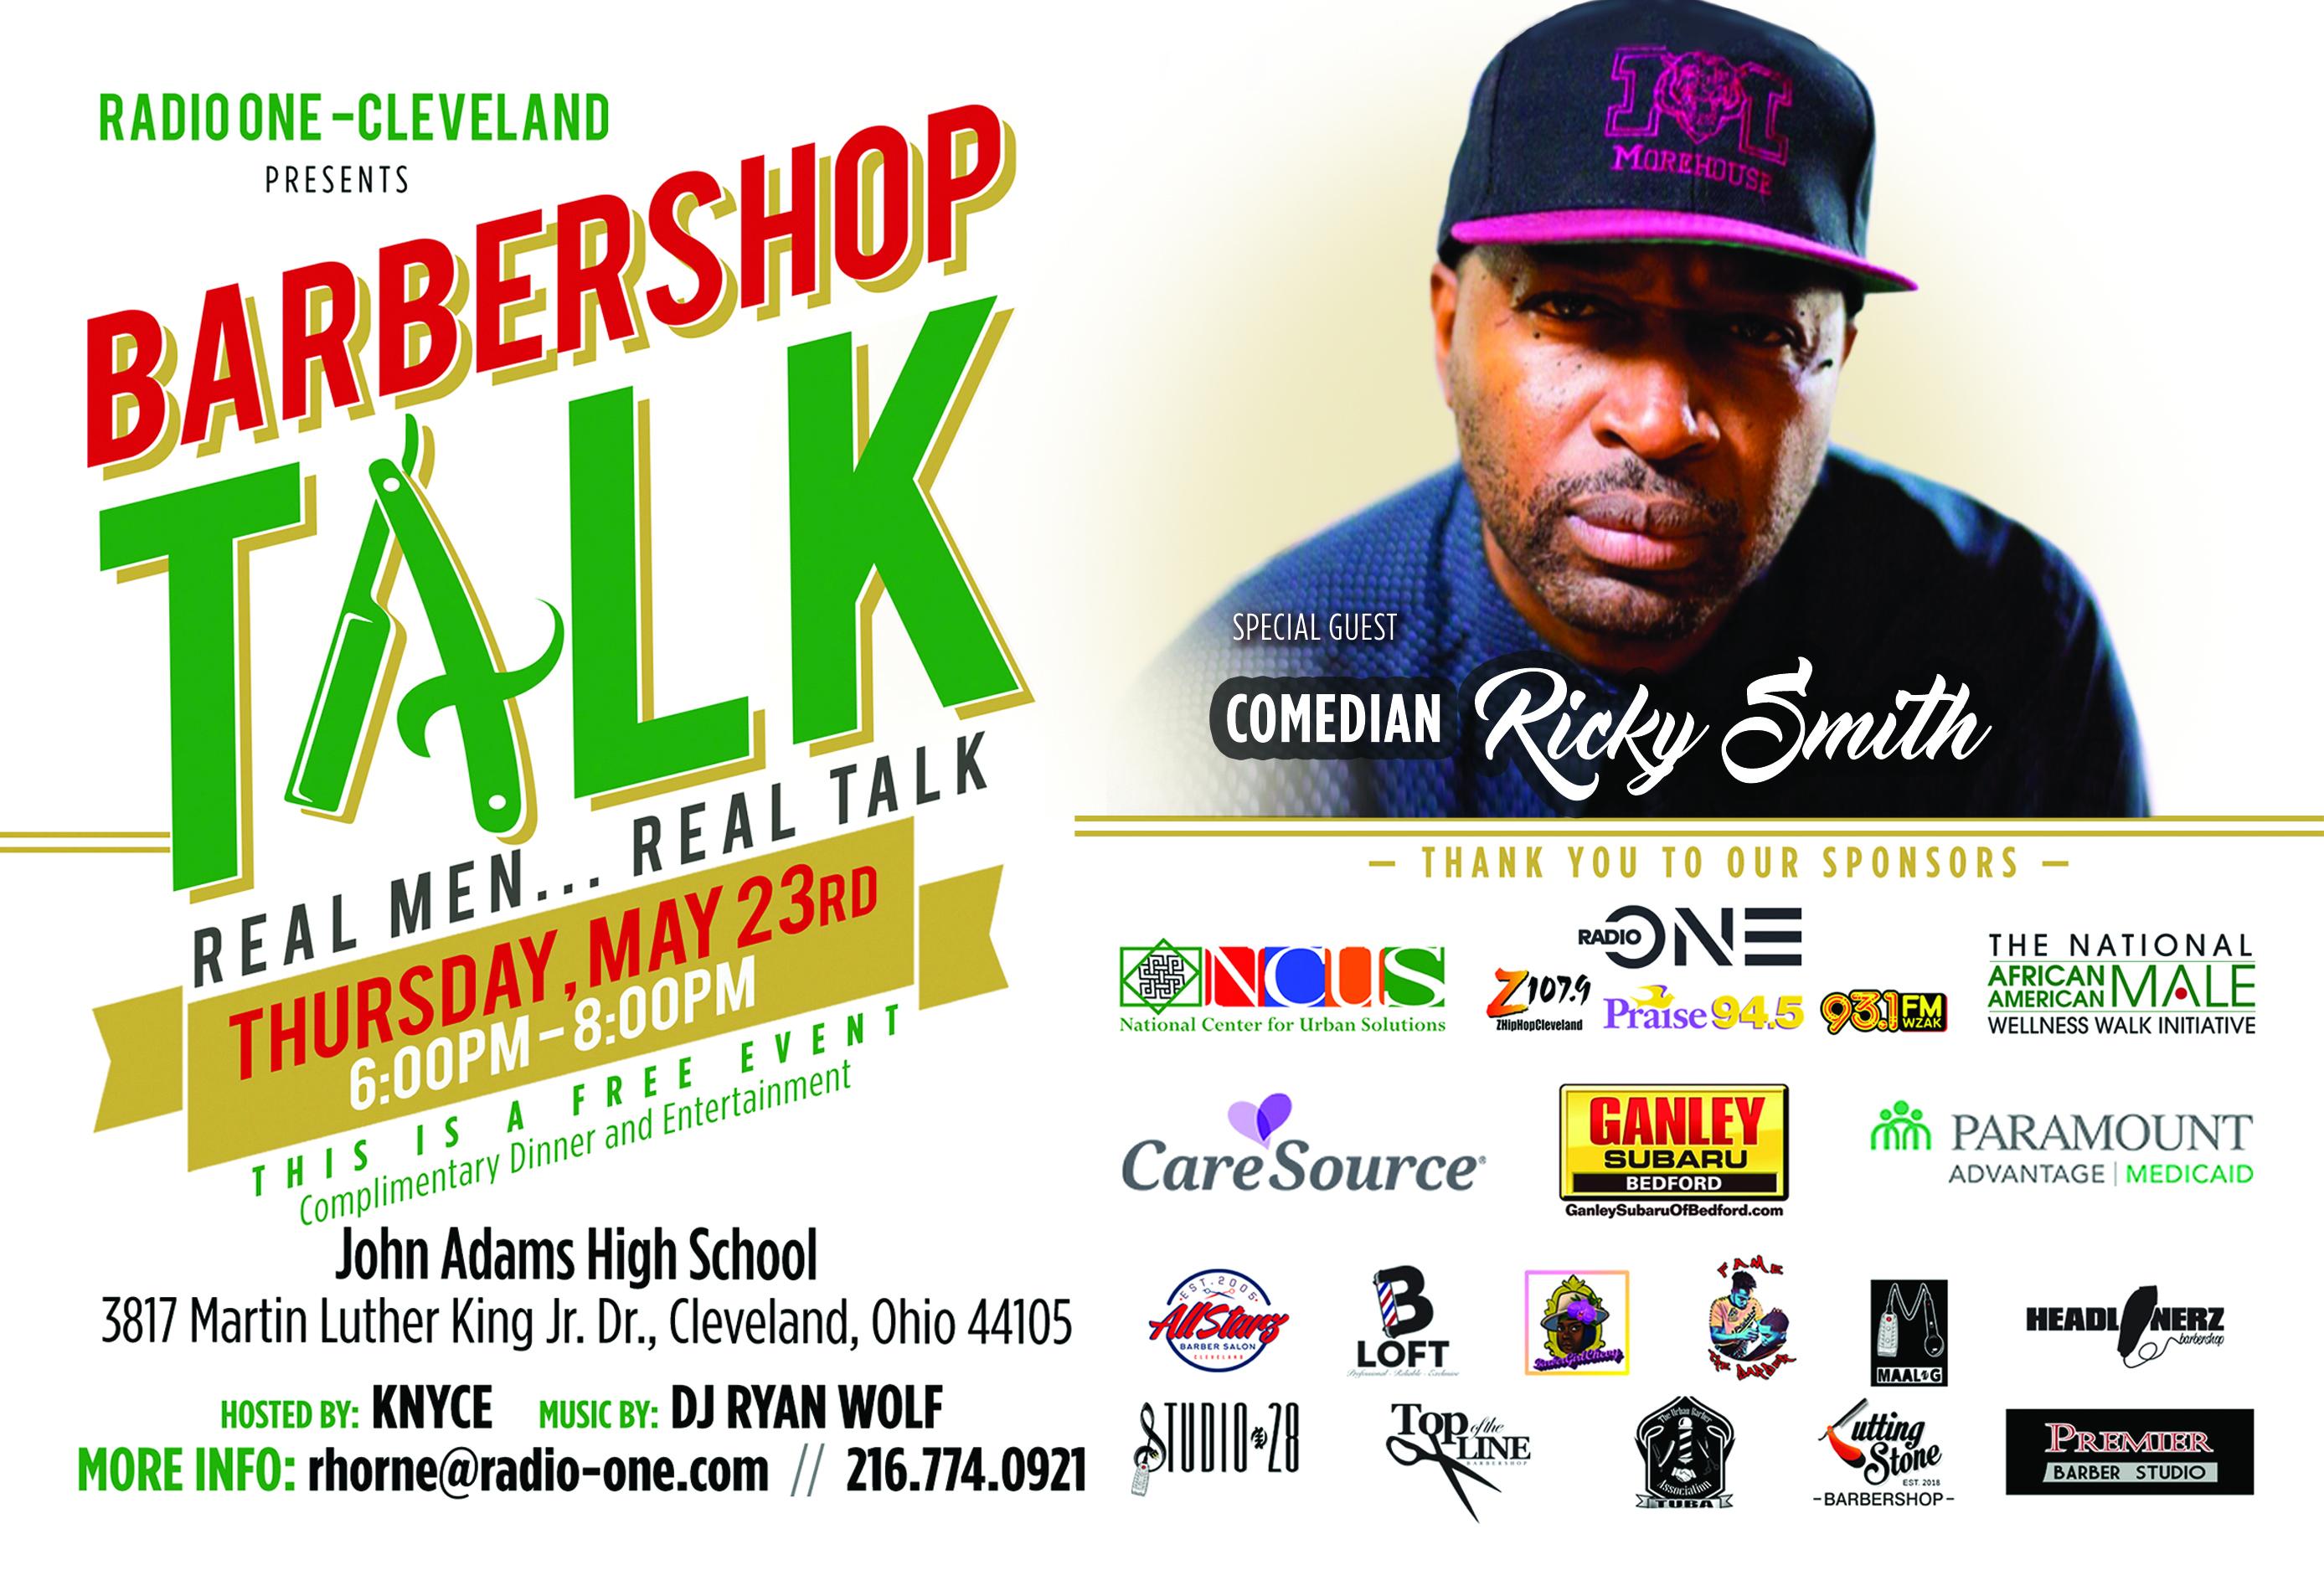 Barbershop Talk – Real Men, Real Conversations | Z 107 9